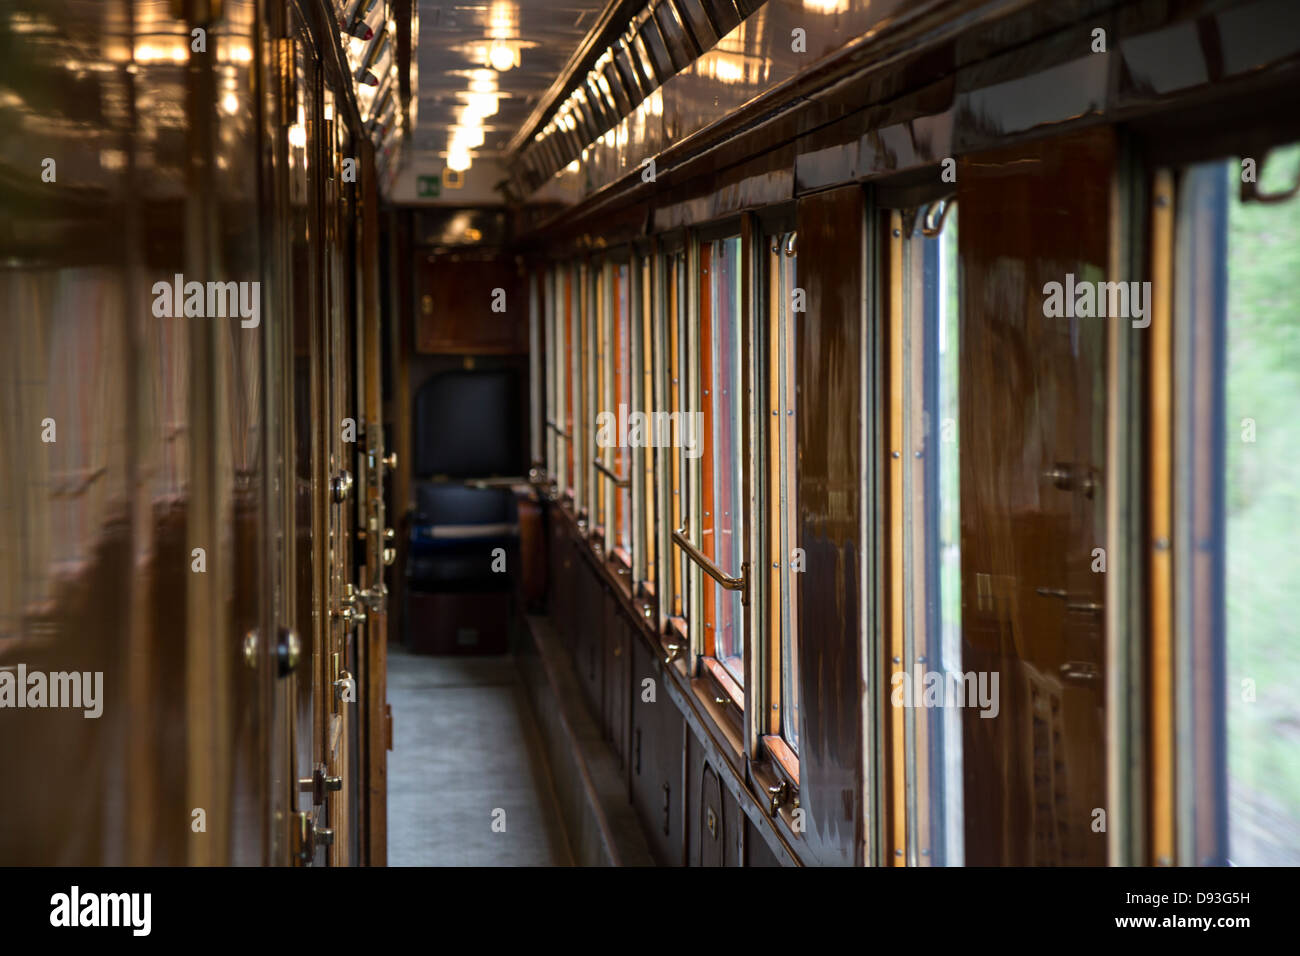 Venice Simplon Orient Express Train Carriage Interior